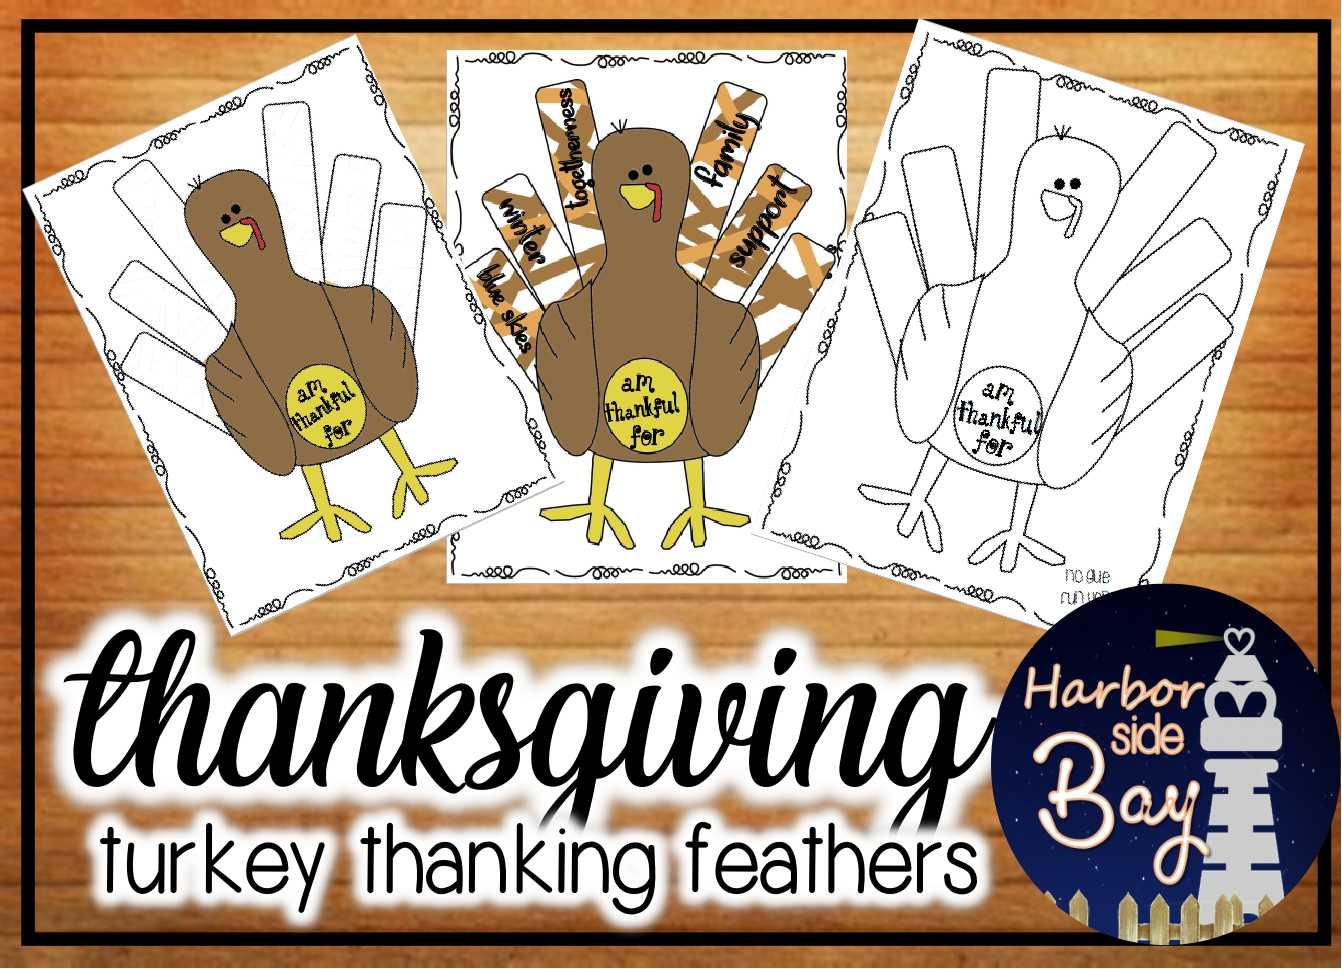 Thanksgiving Accion de Gracias Thankful Turkey